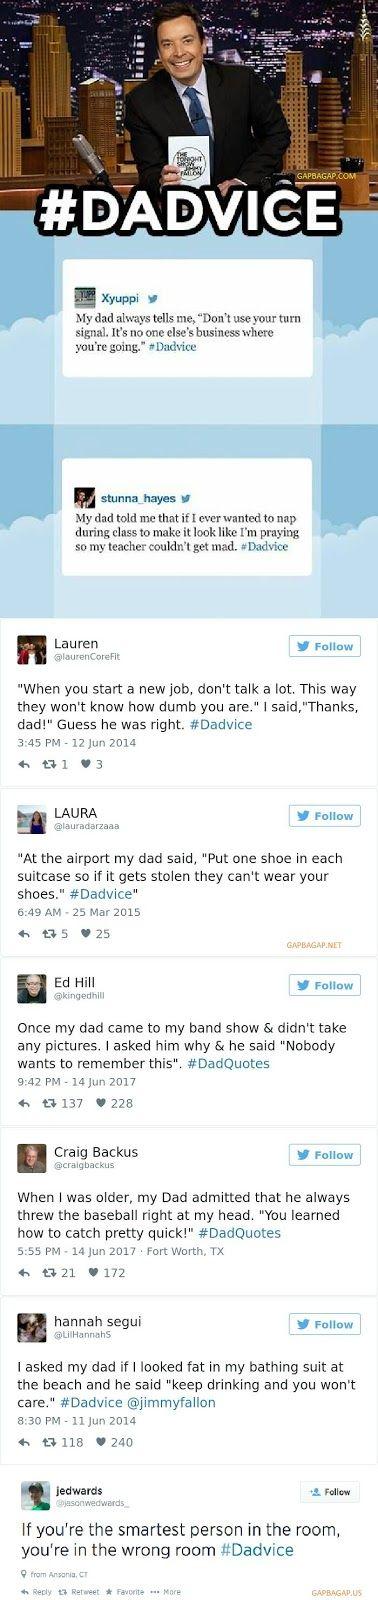 Best Fυииιєѕ Images On Pinterest Hilarious Random Stuff - The 20 funniest tweets from parents since 2017